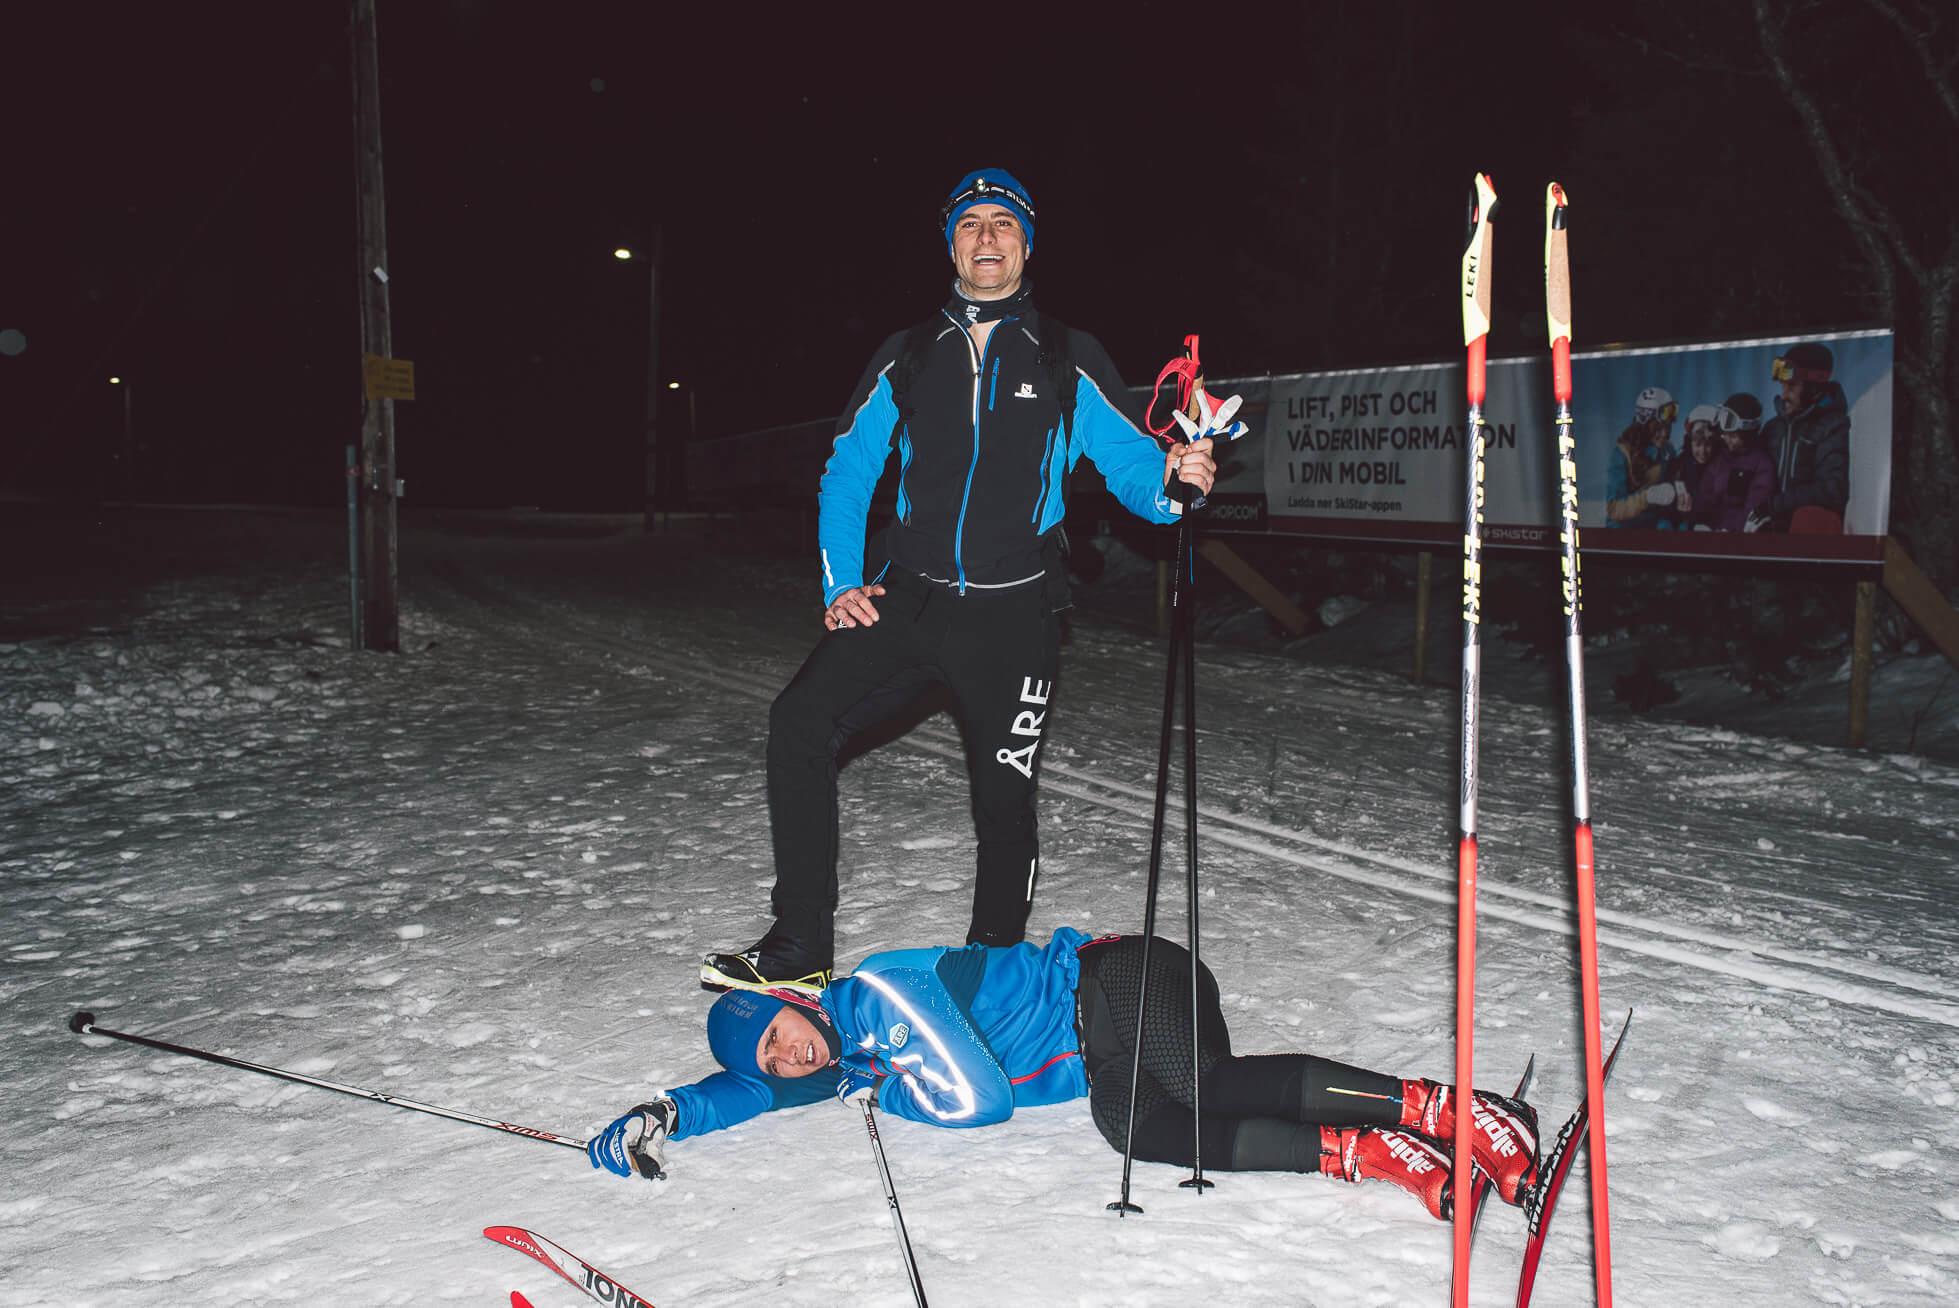 janni-deler-cross-country-skiingDSC_7896